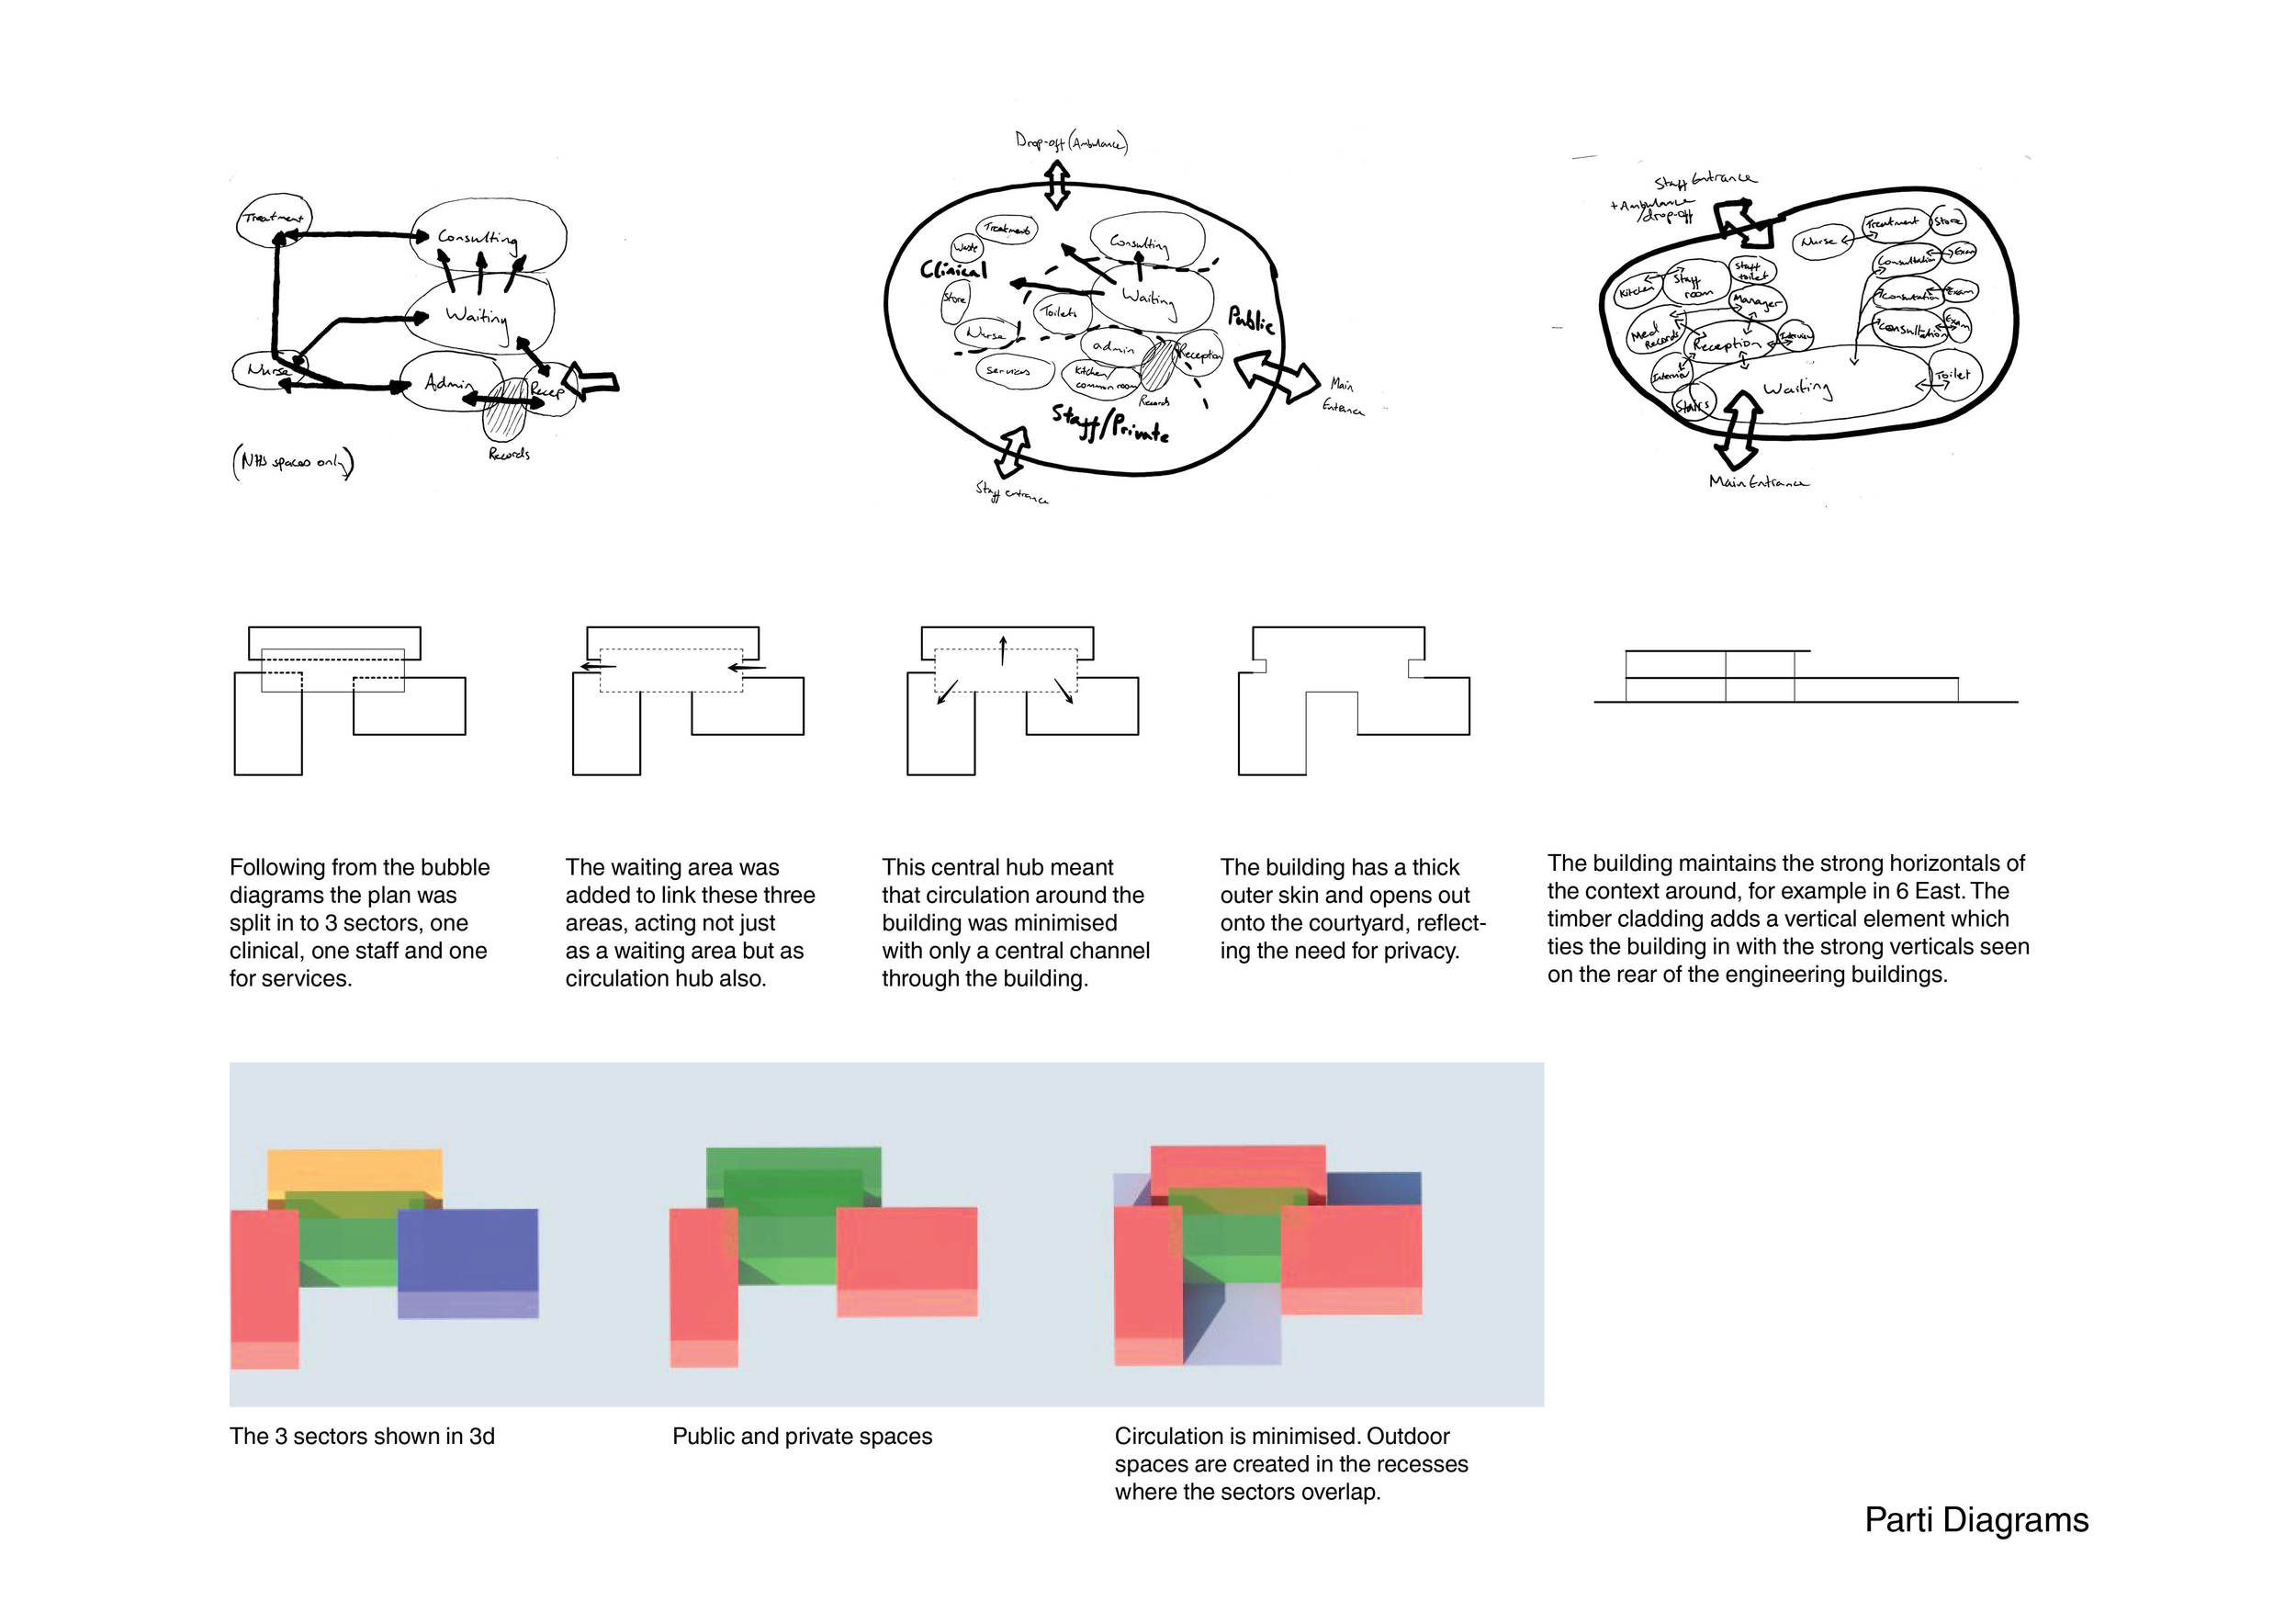 parti diagrams.jpg